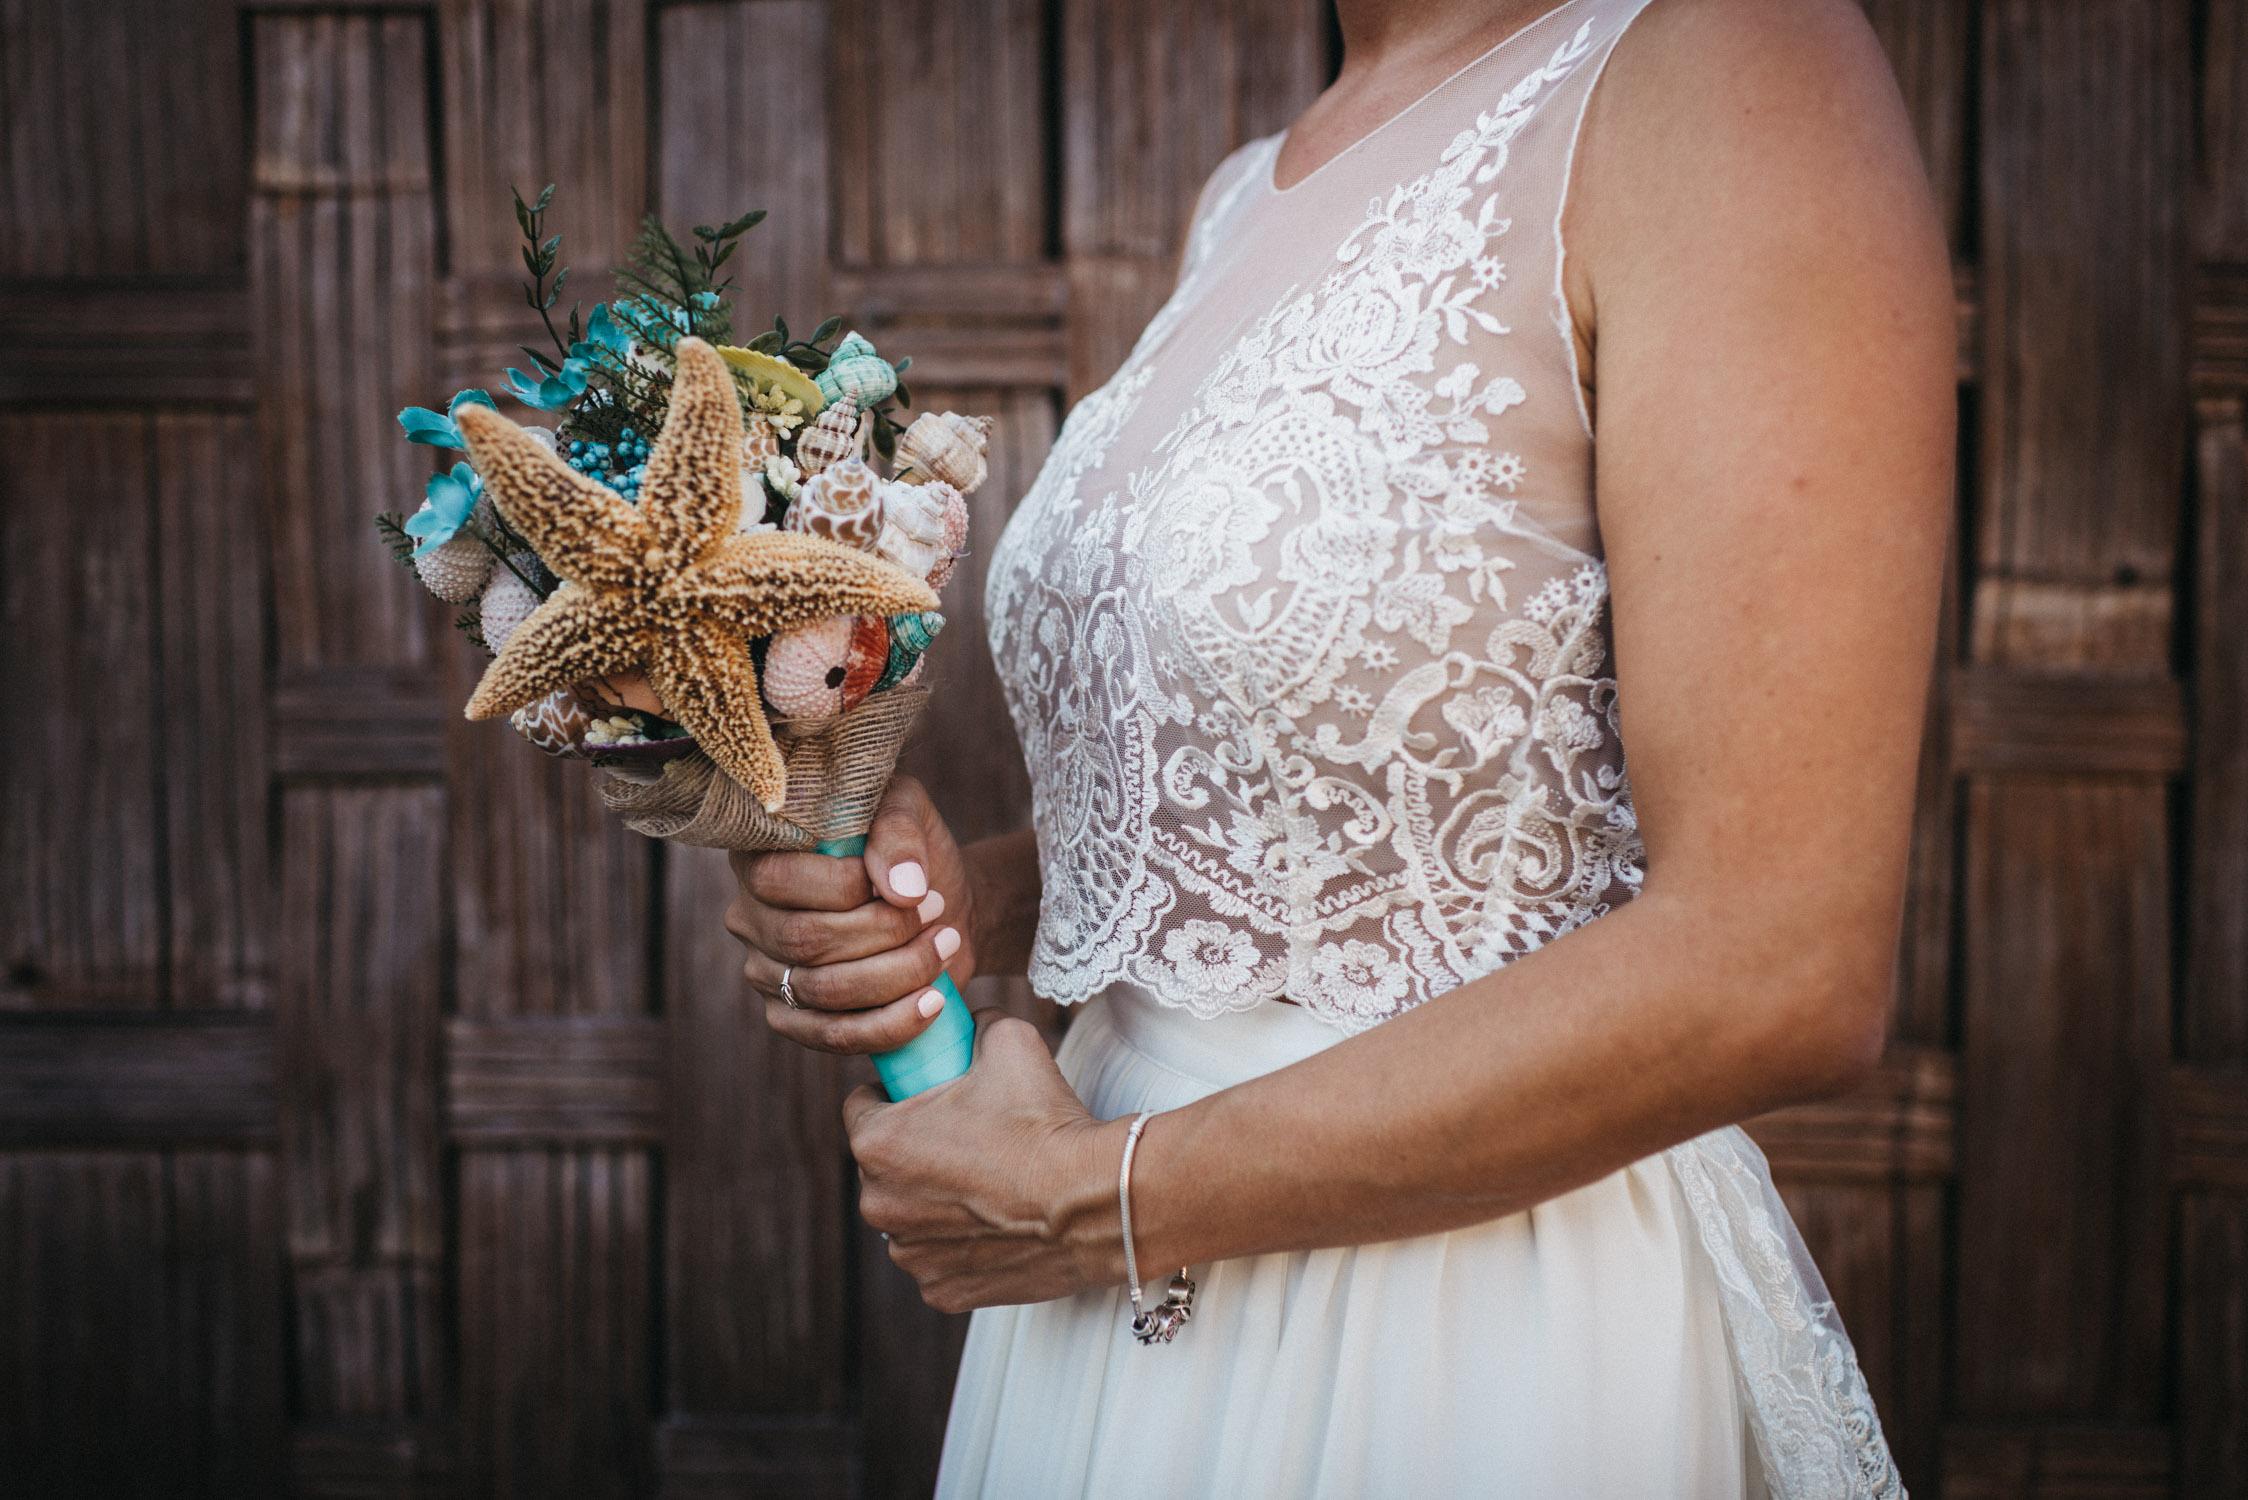 Portada-vanesa-diaz-fotografa-de-bodas-malaga-12